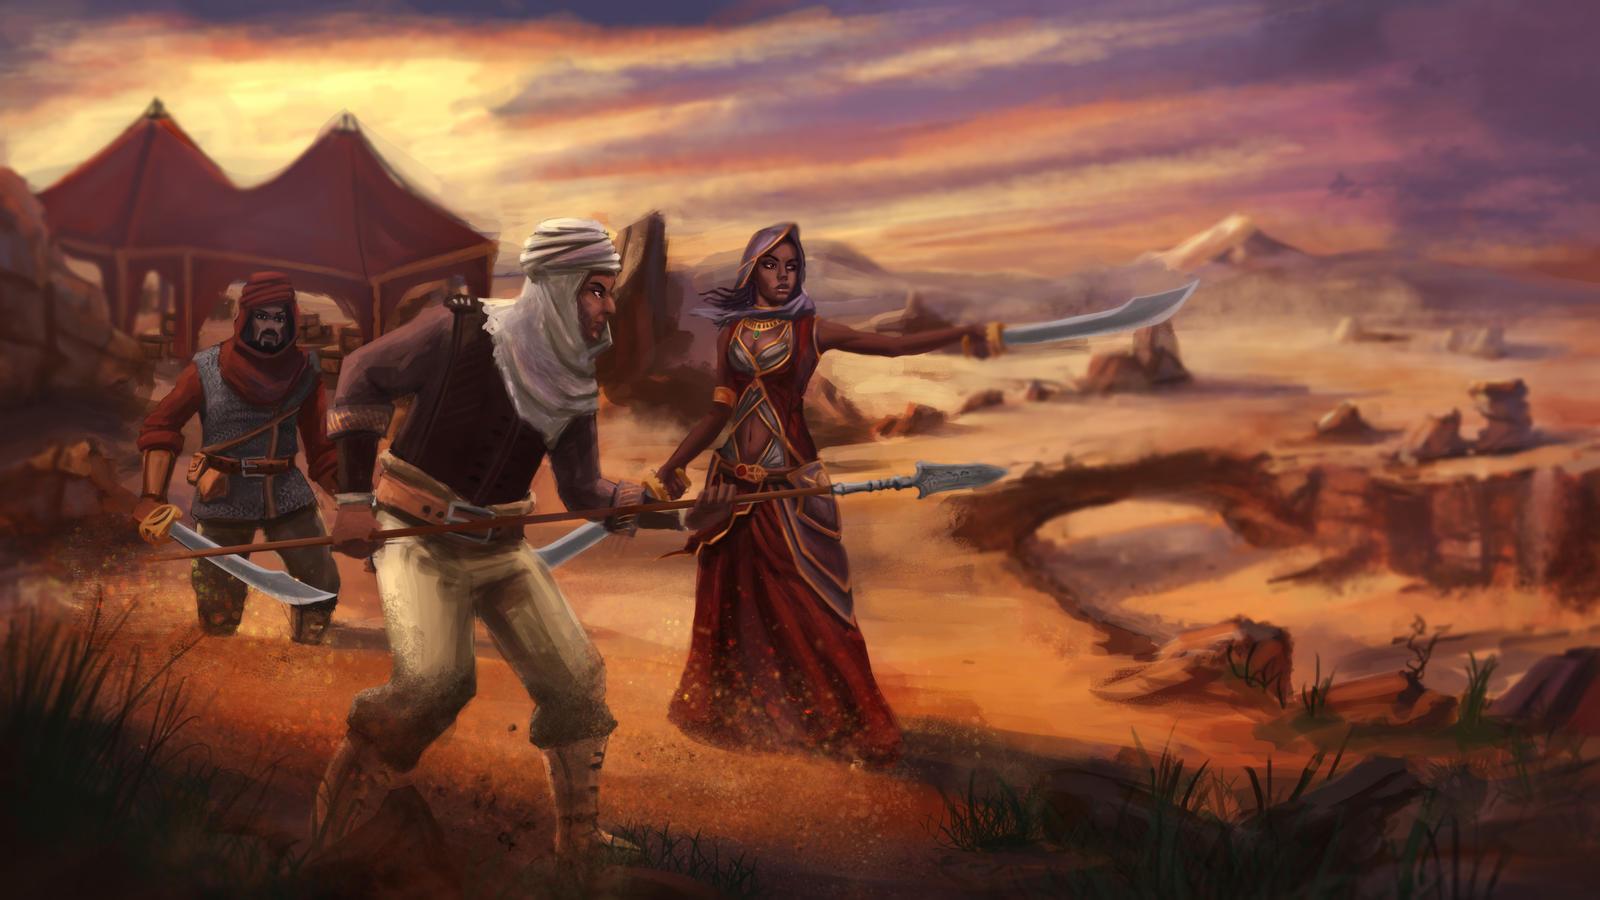 Redguards of Tamriel [PC Directory] Play Elder Scrolls Redguard Online